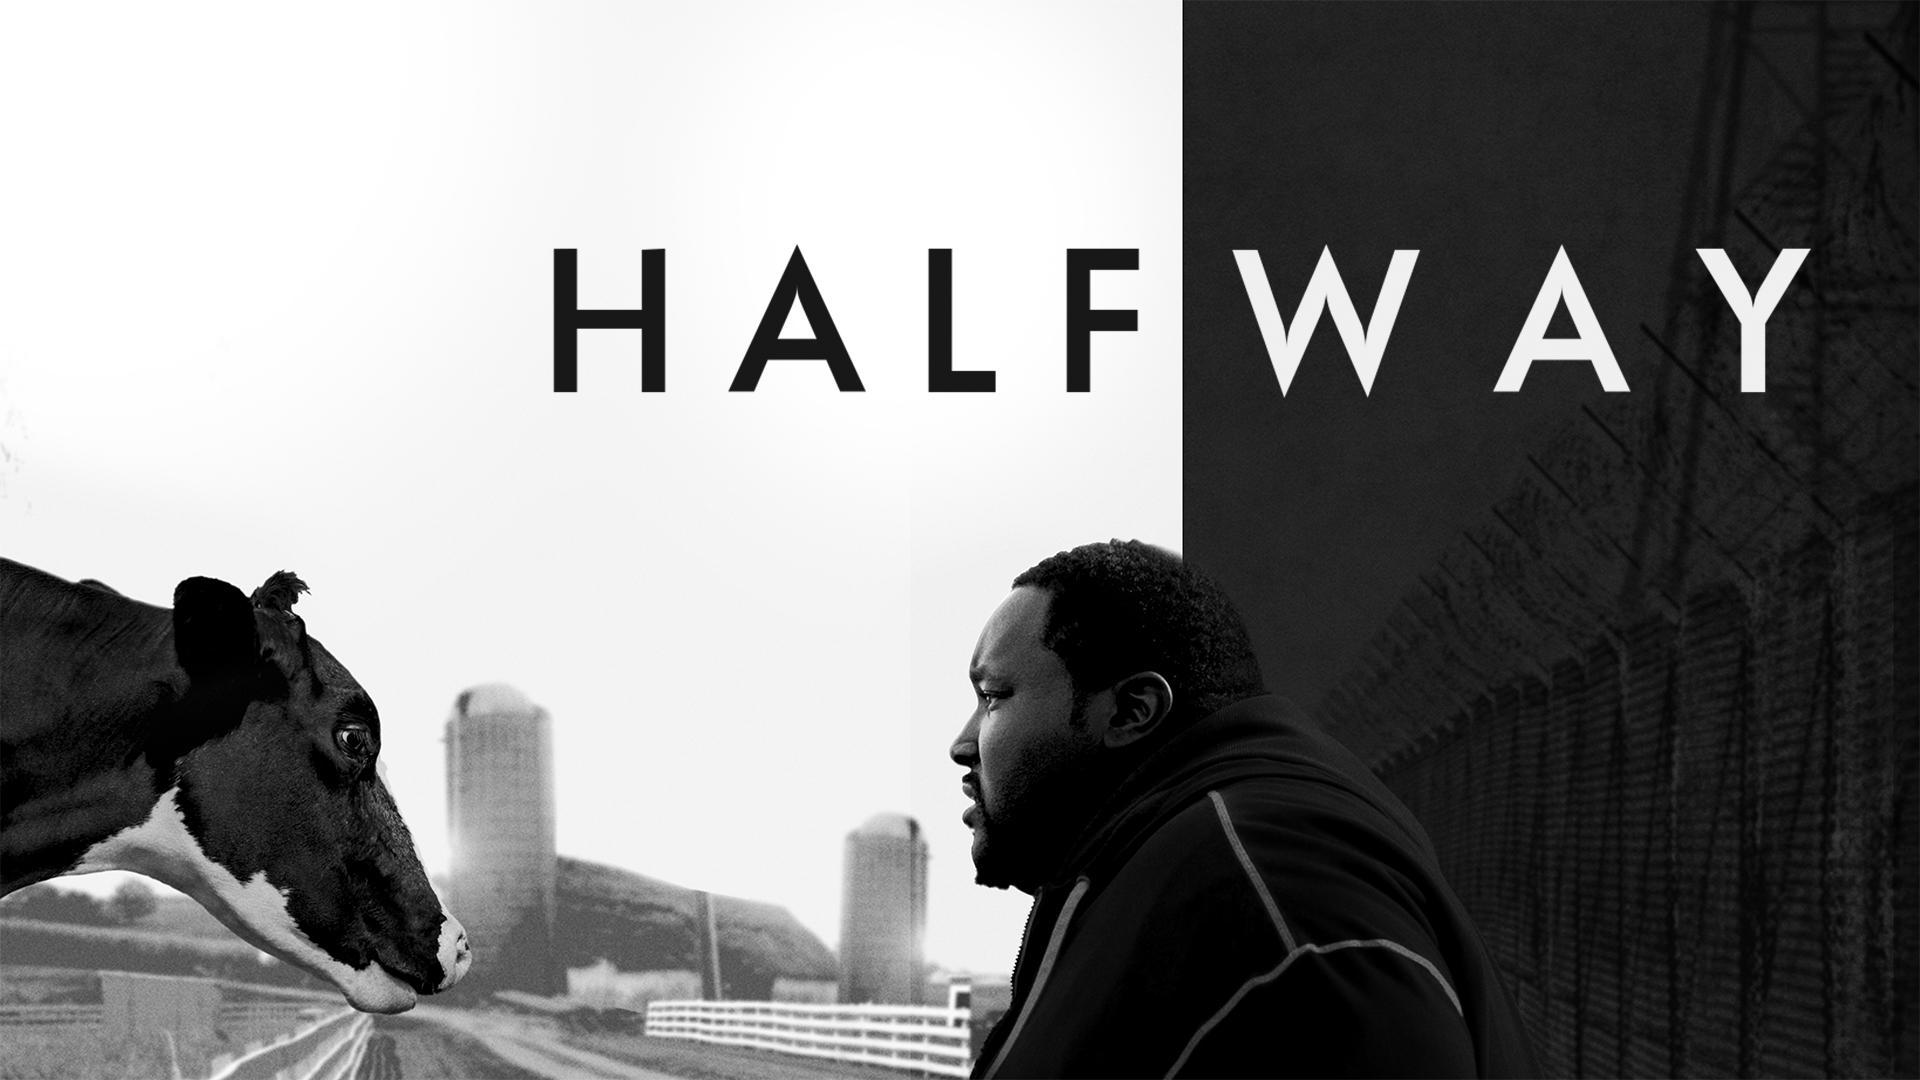 Halfway - Drama category image